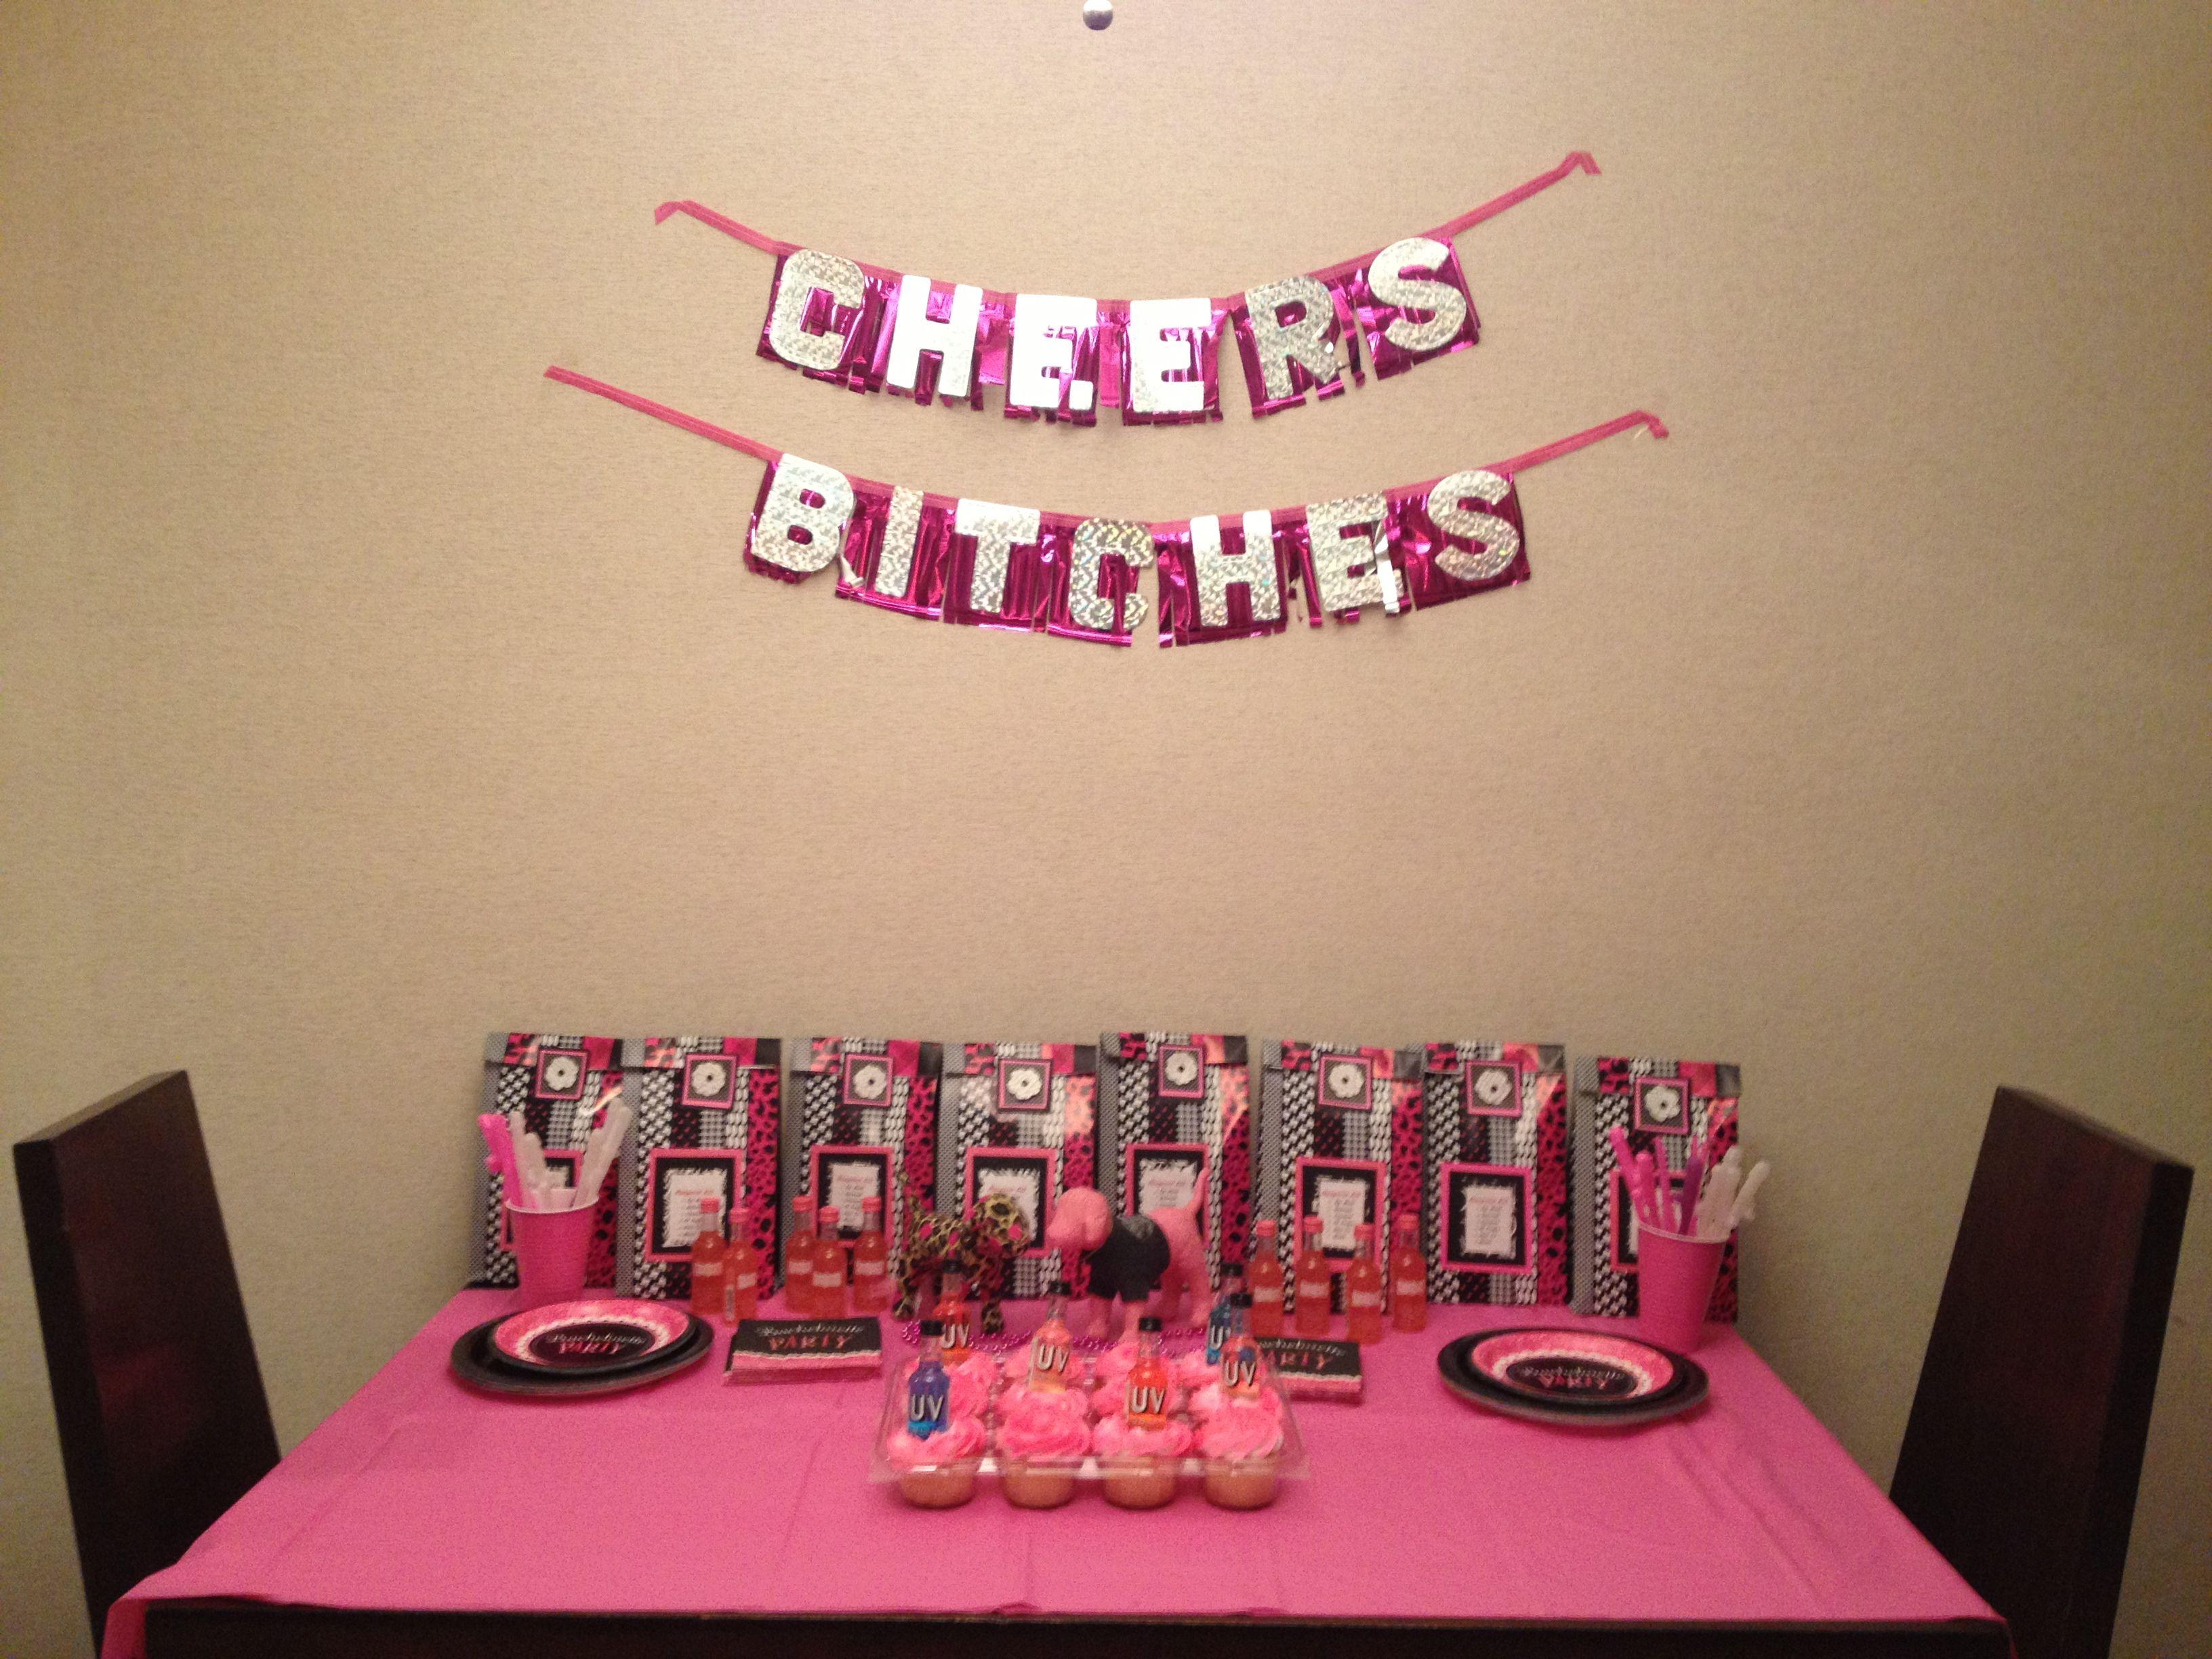 Bachelorette party decor at hotel wedding shower ideas for Good places for bachelorette parties